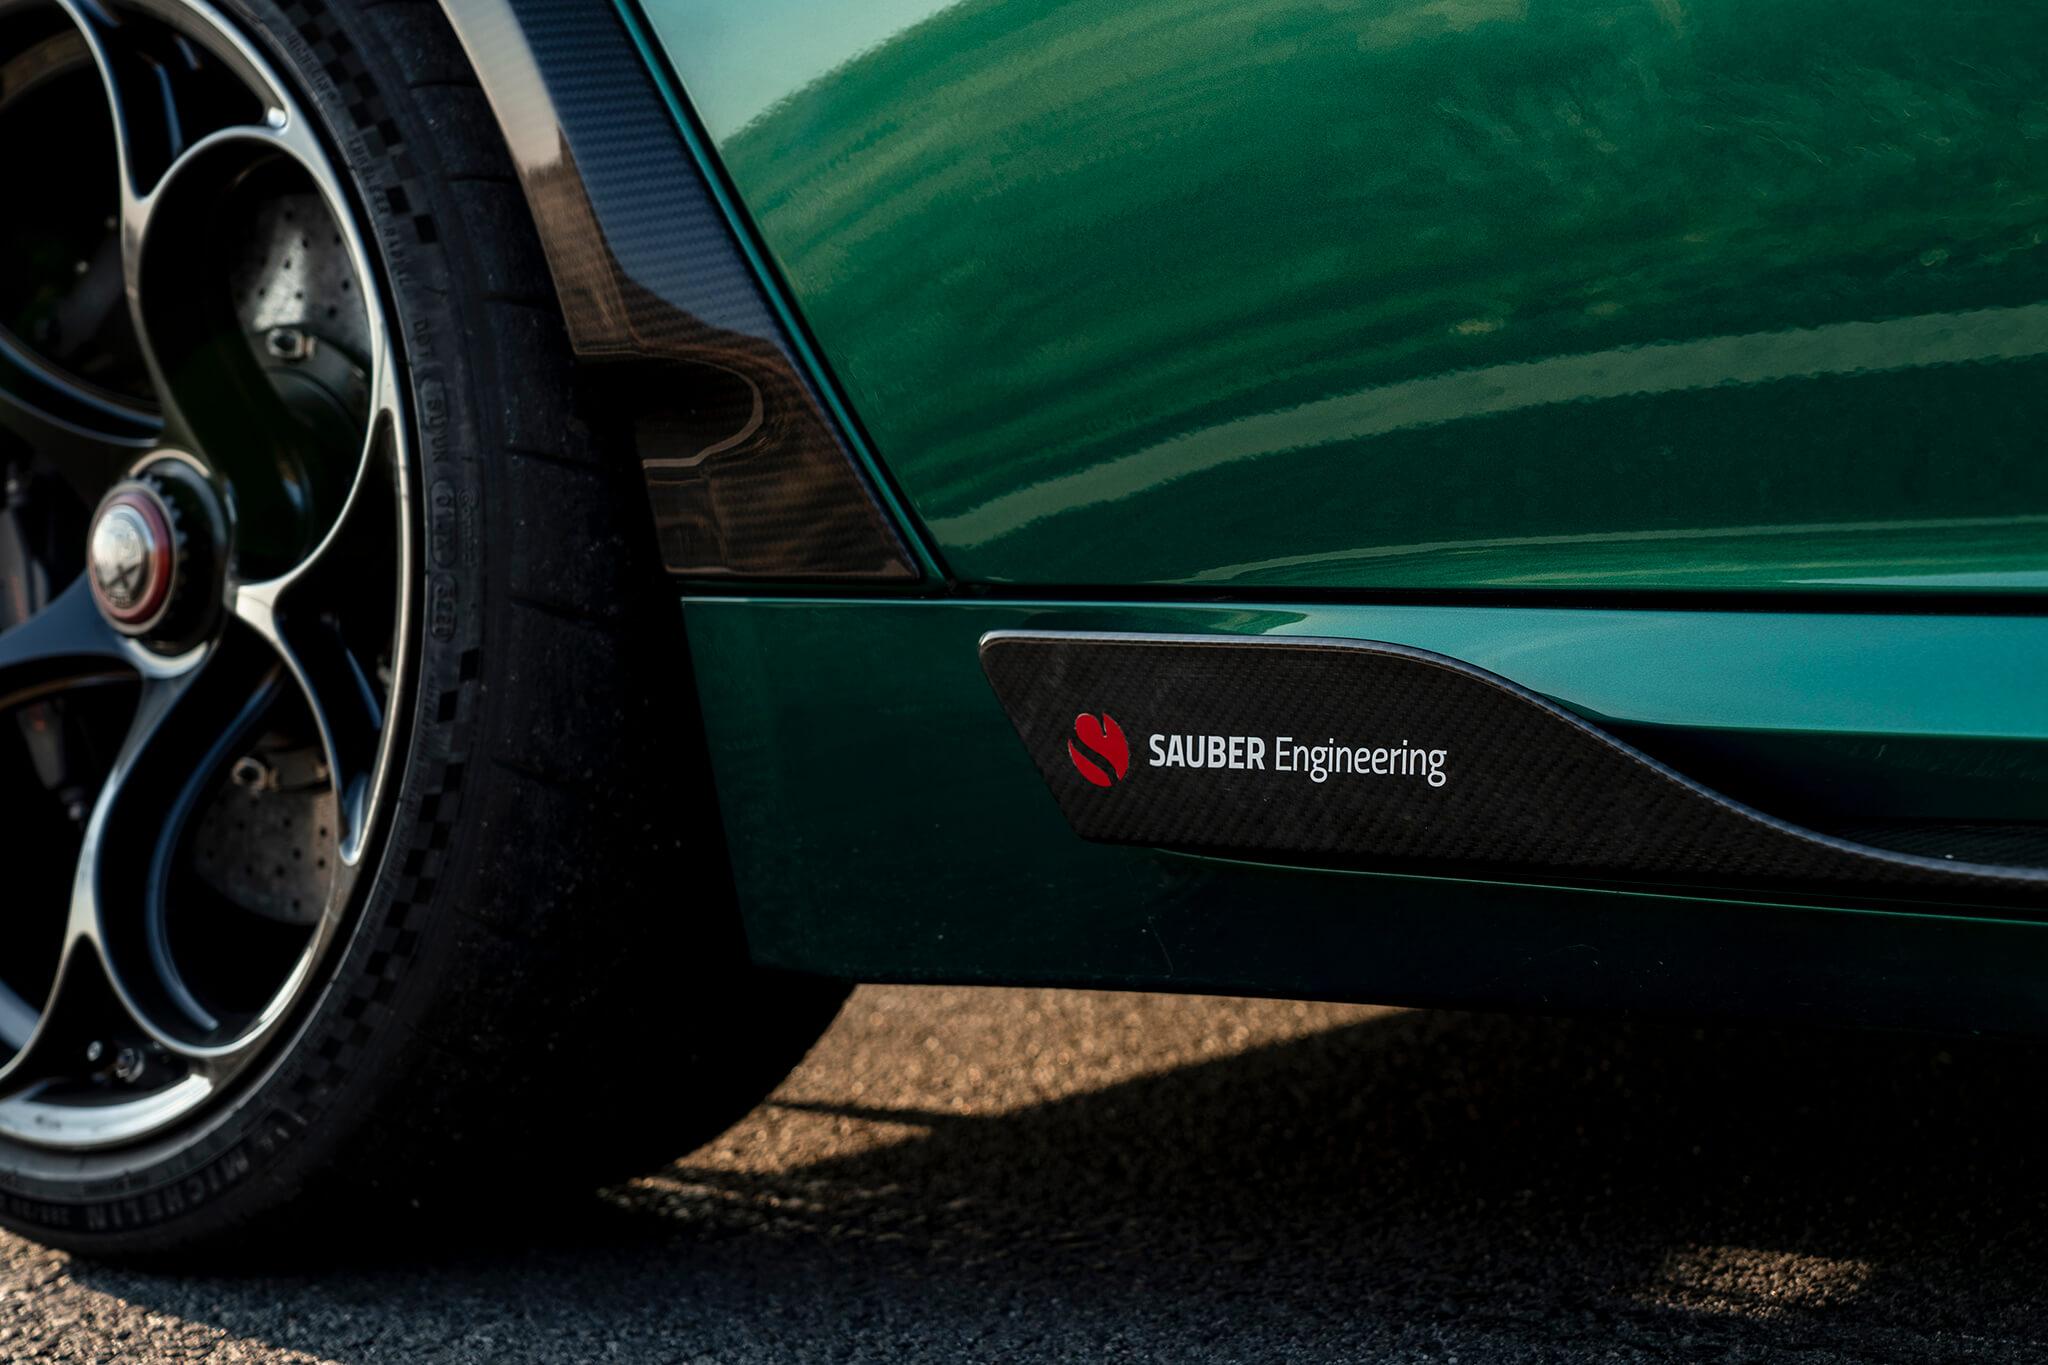 Emblema Sauber Engineering